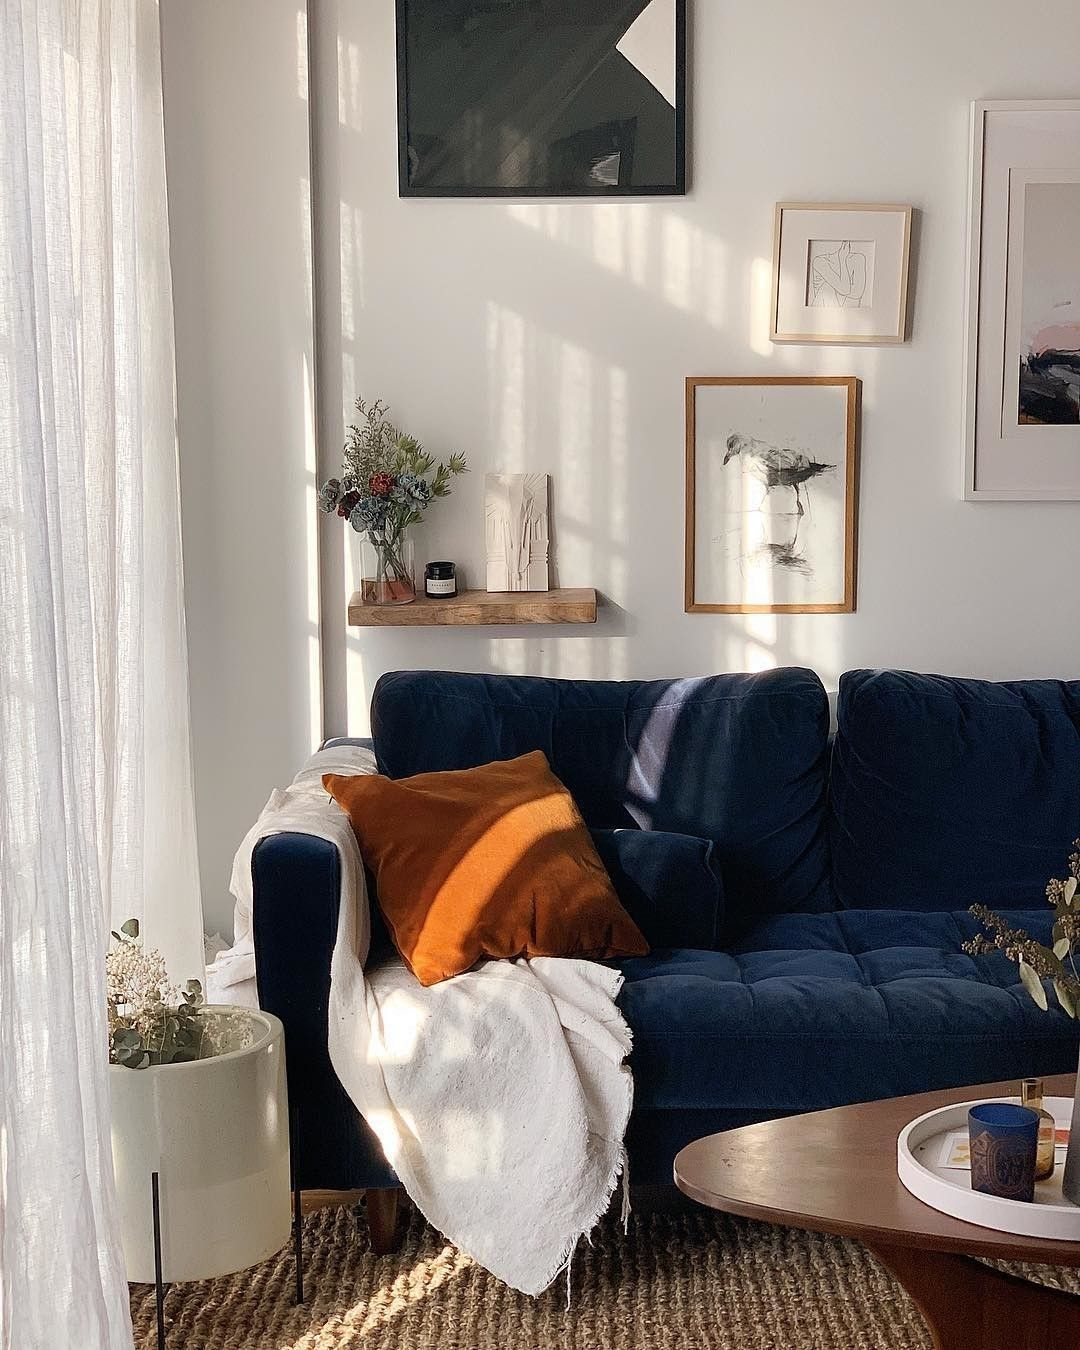 How To Decorate Around A Blue Velvet Sofa Velvet Sofa Living Room Blue Sofas Living Room Blue Sofa Living